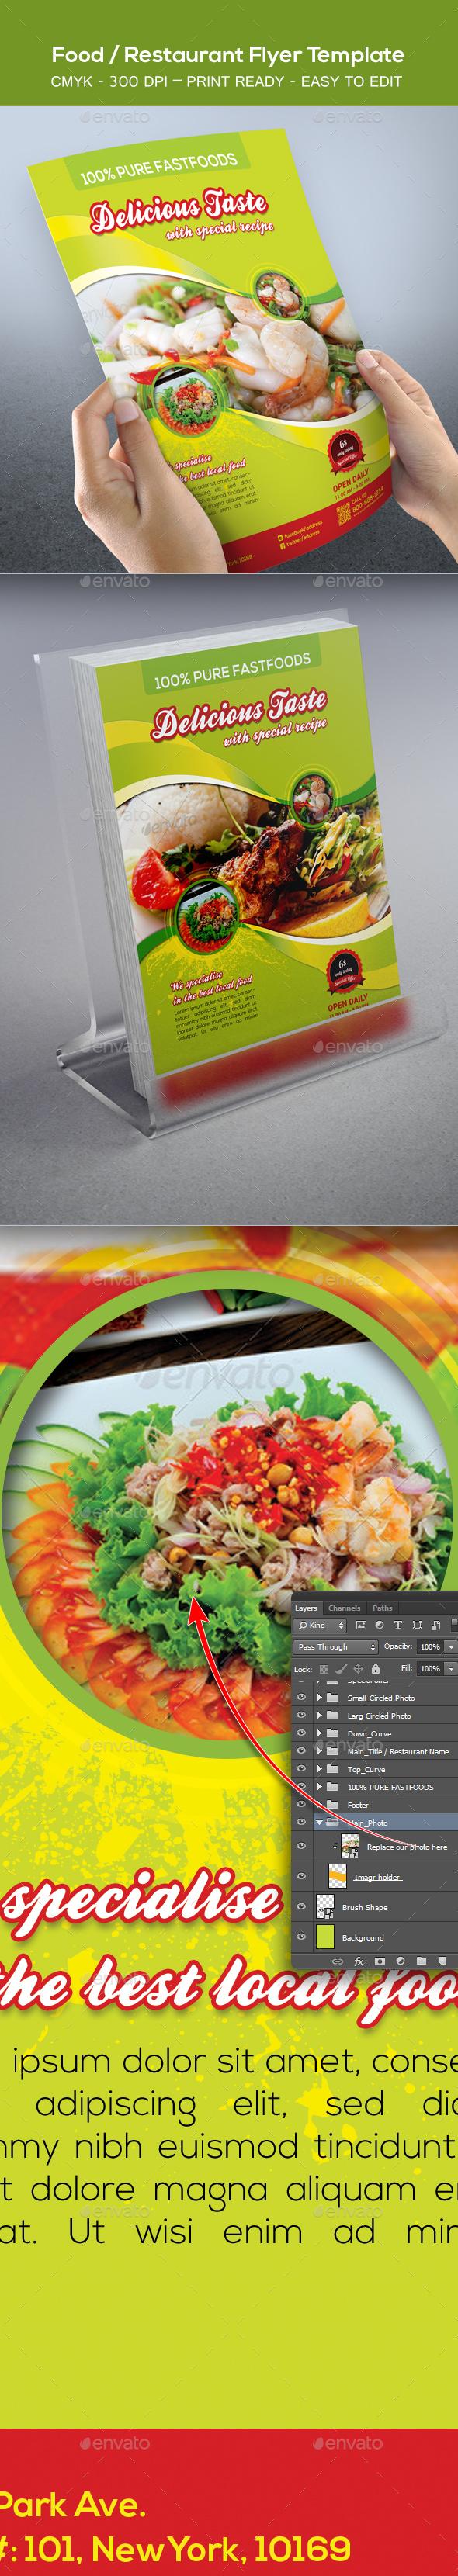 Food / Restaurant Flyer Template